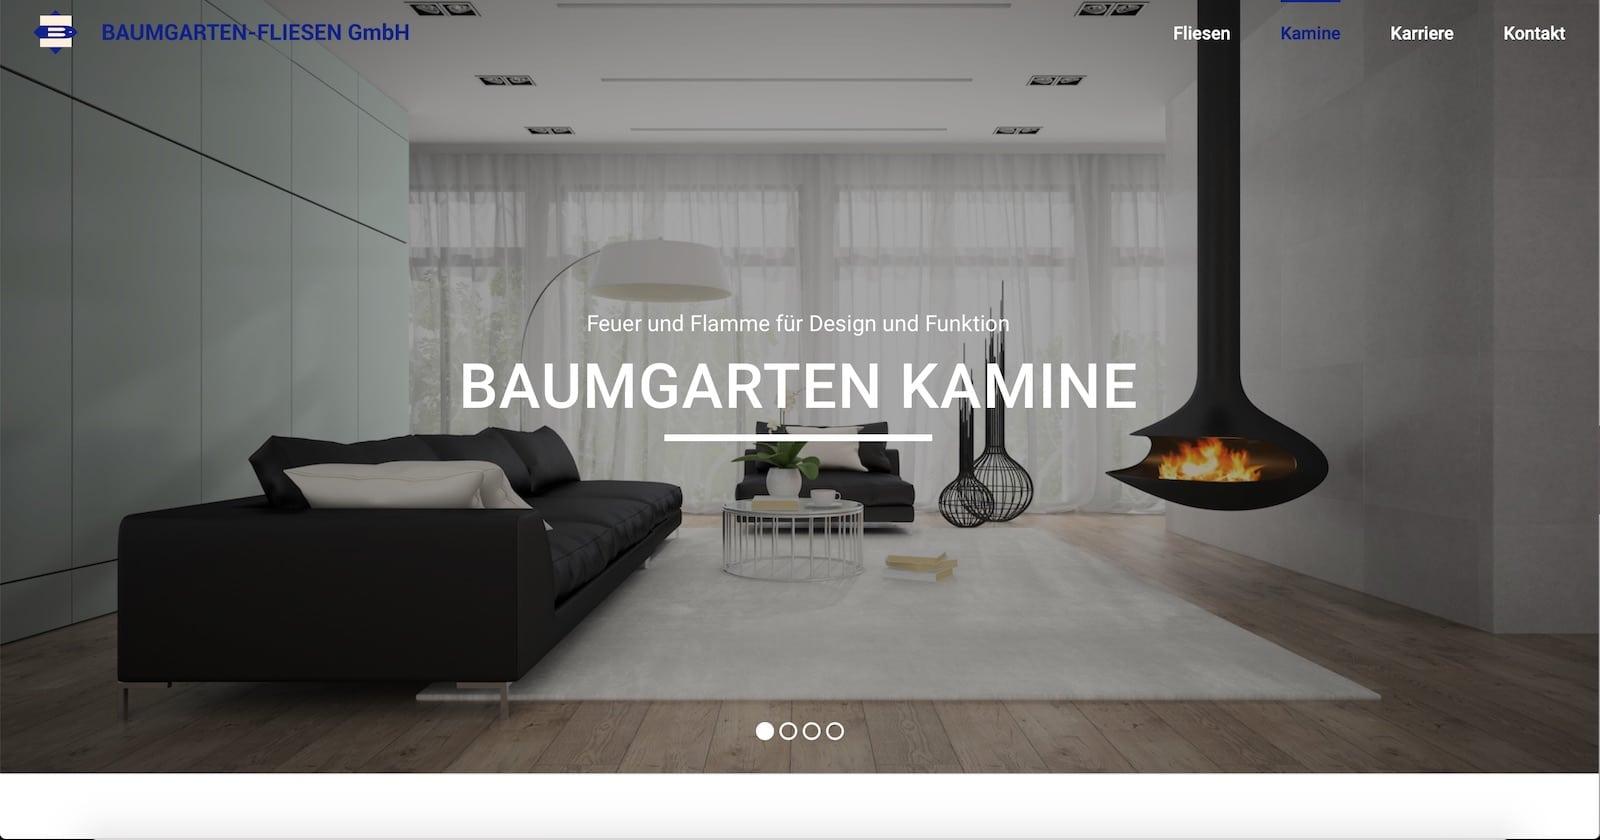 Handwerker Webseite Fliesenleger Baumgarten